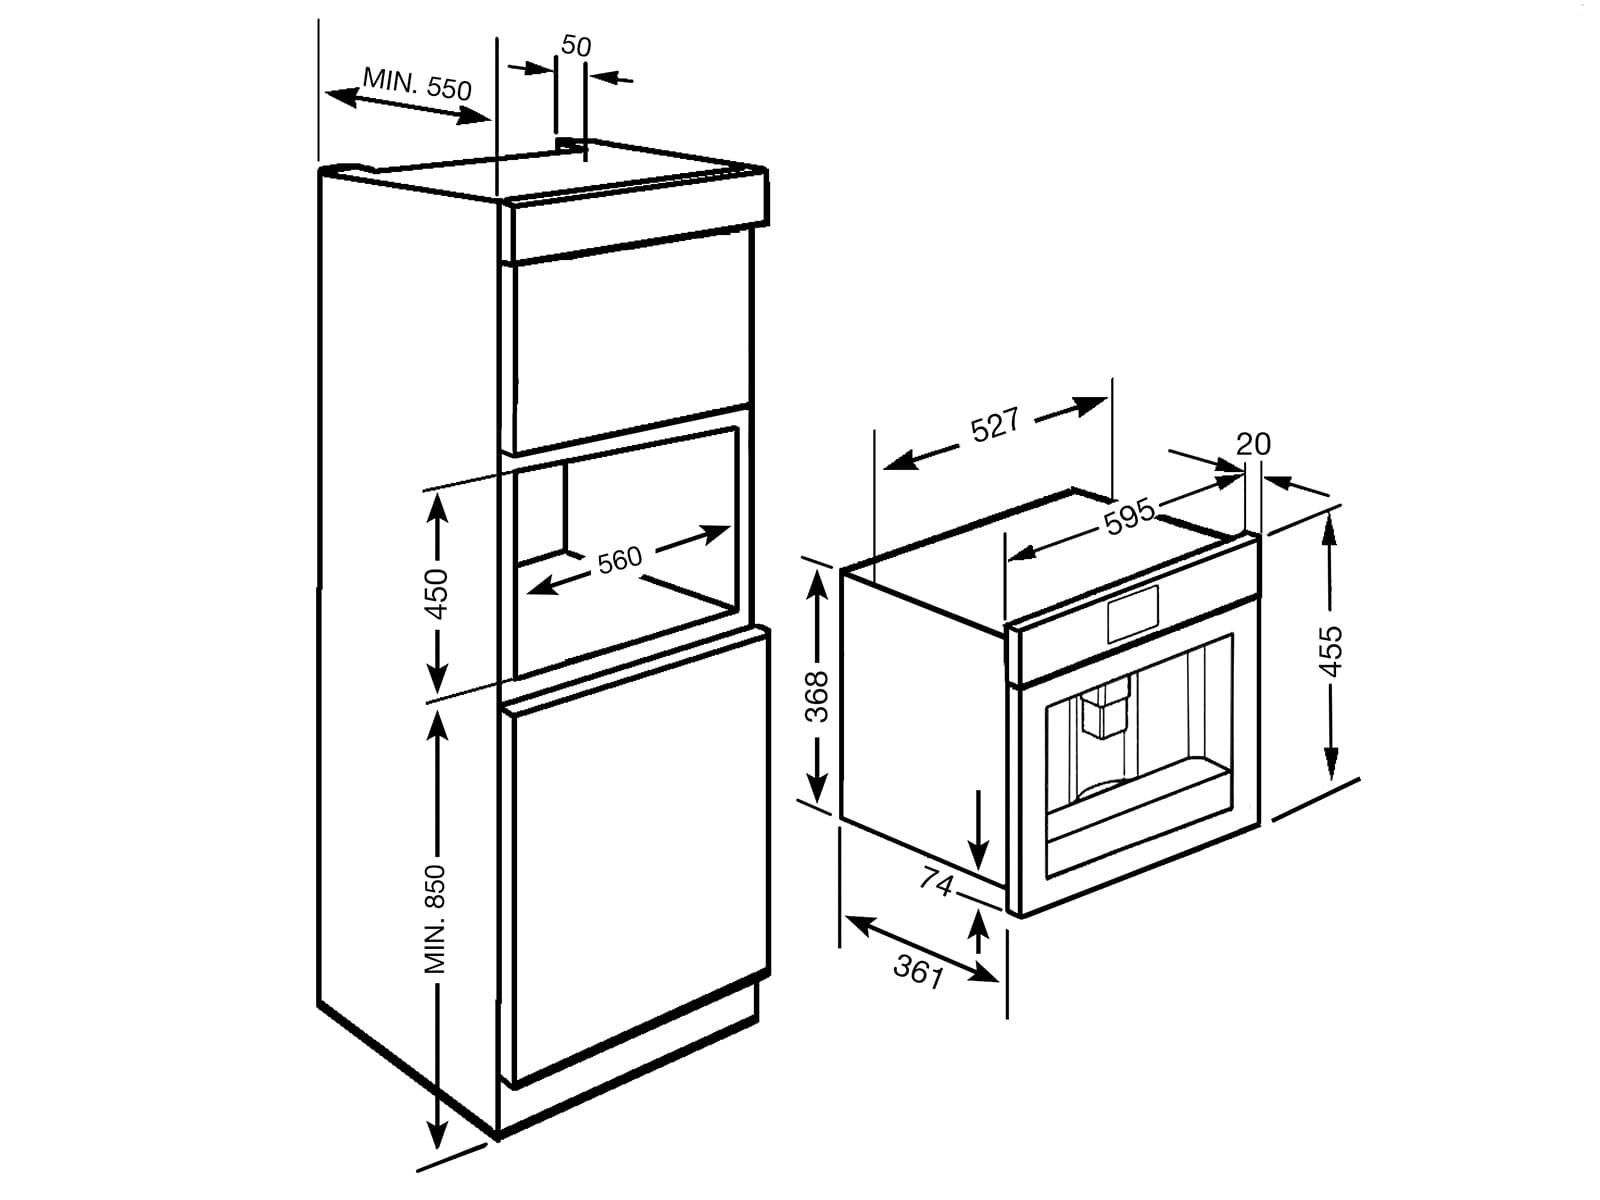 Smeg CMS4104N Einbau-Espresso-/Kaffeevollautomat Schwarzglas